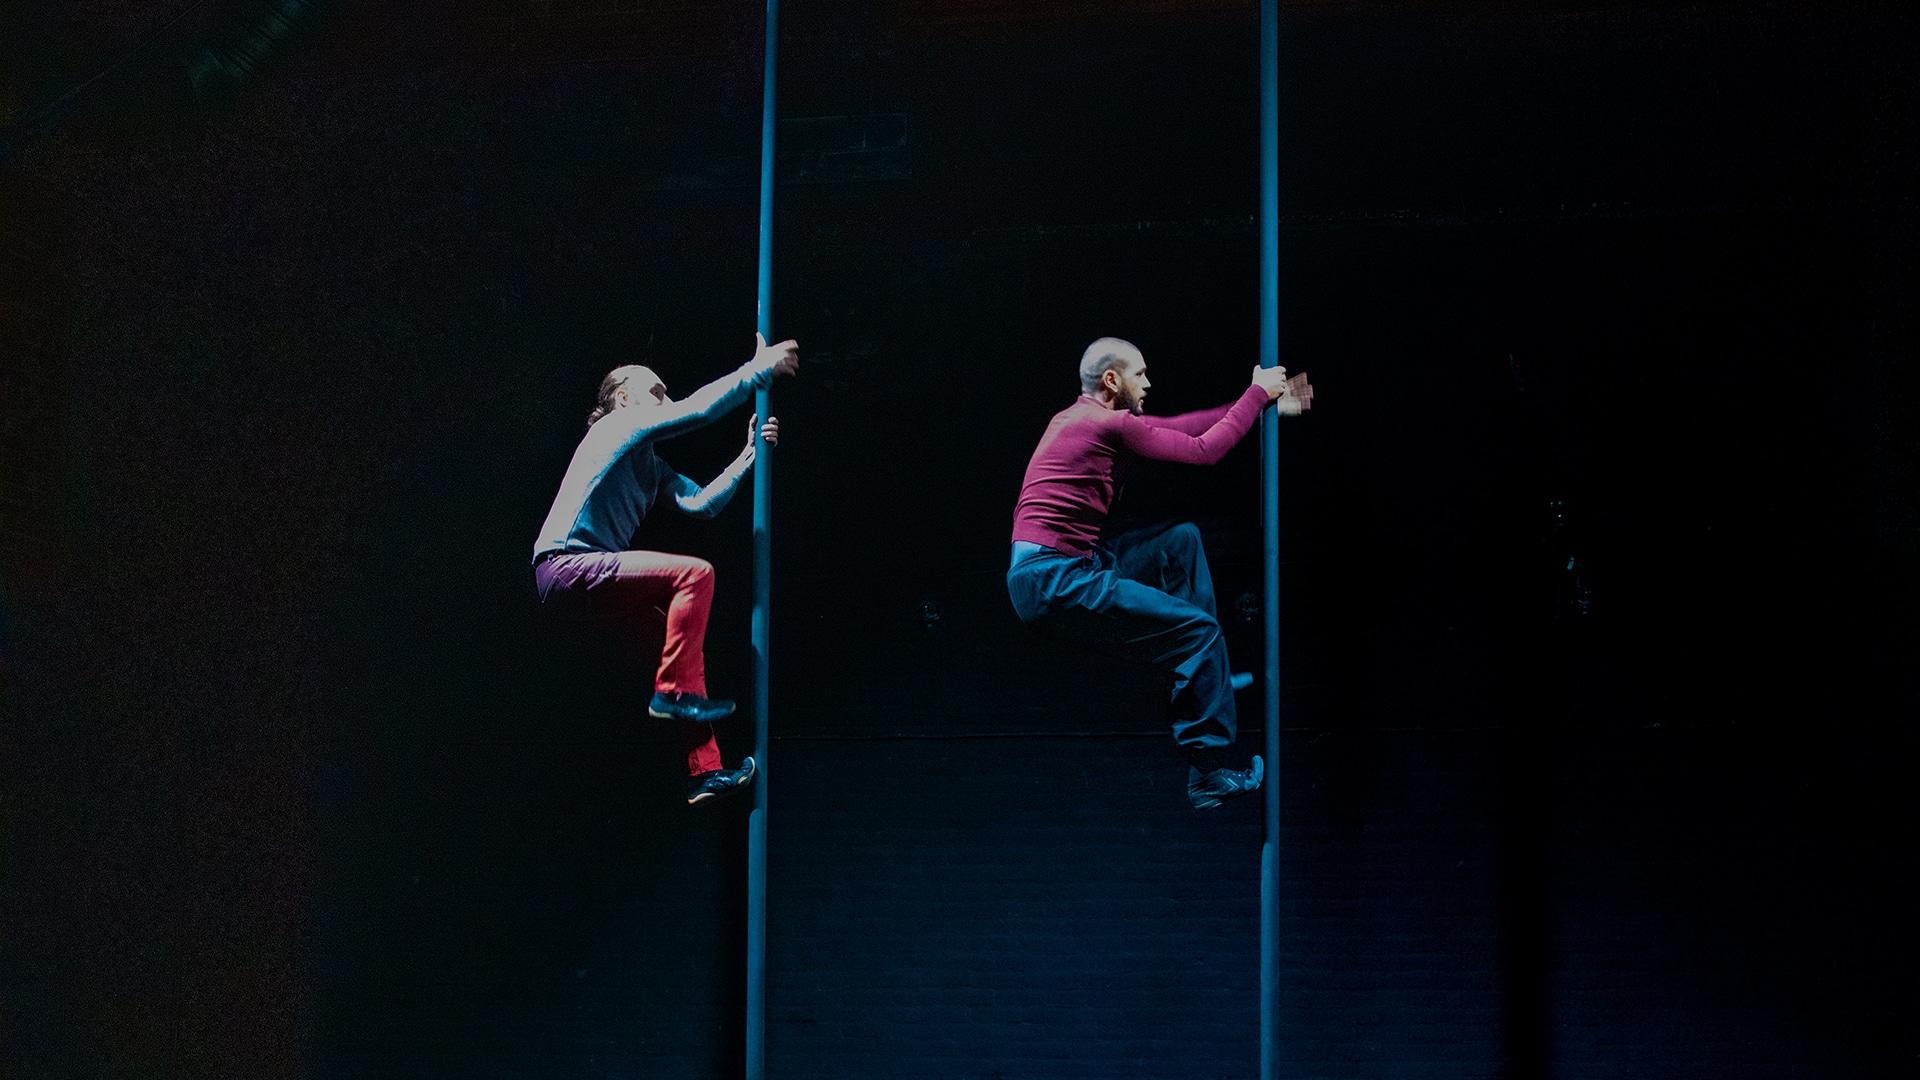 Sadiq Ali and Hauk Pattison climb Chinese poles